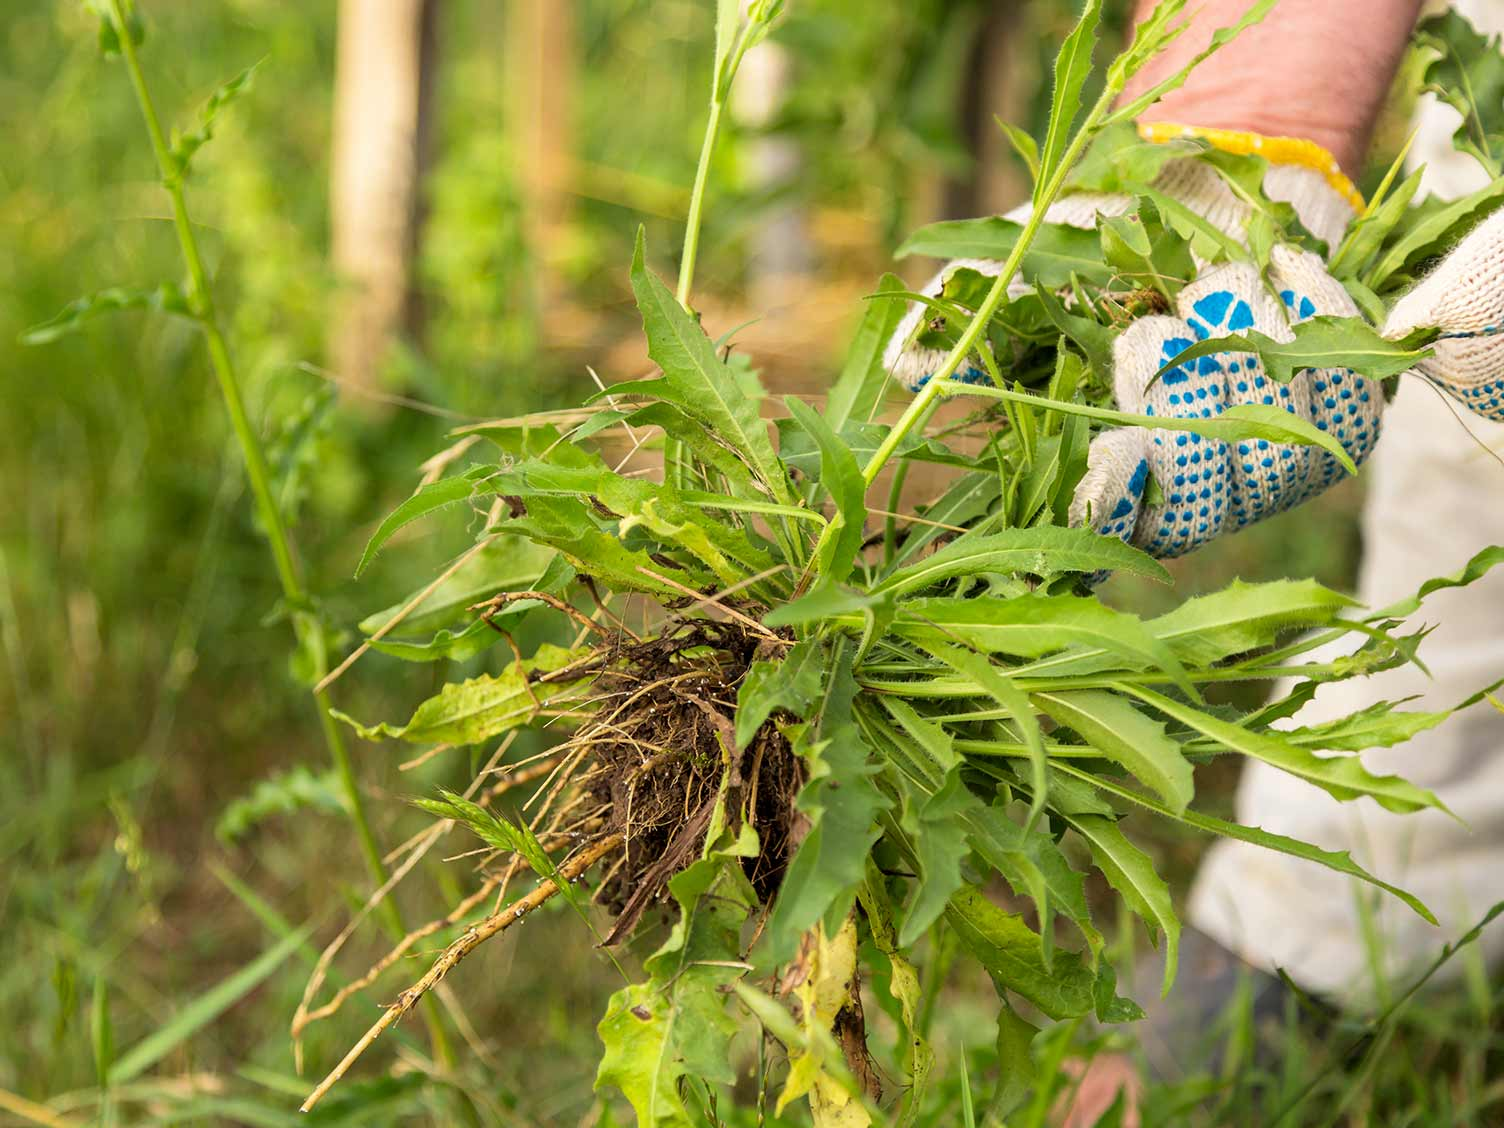 https://www.lovethegarden.com/sites/default/files/content/articles/UK_pulling-up-weeds-by-hand.jpg